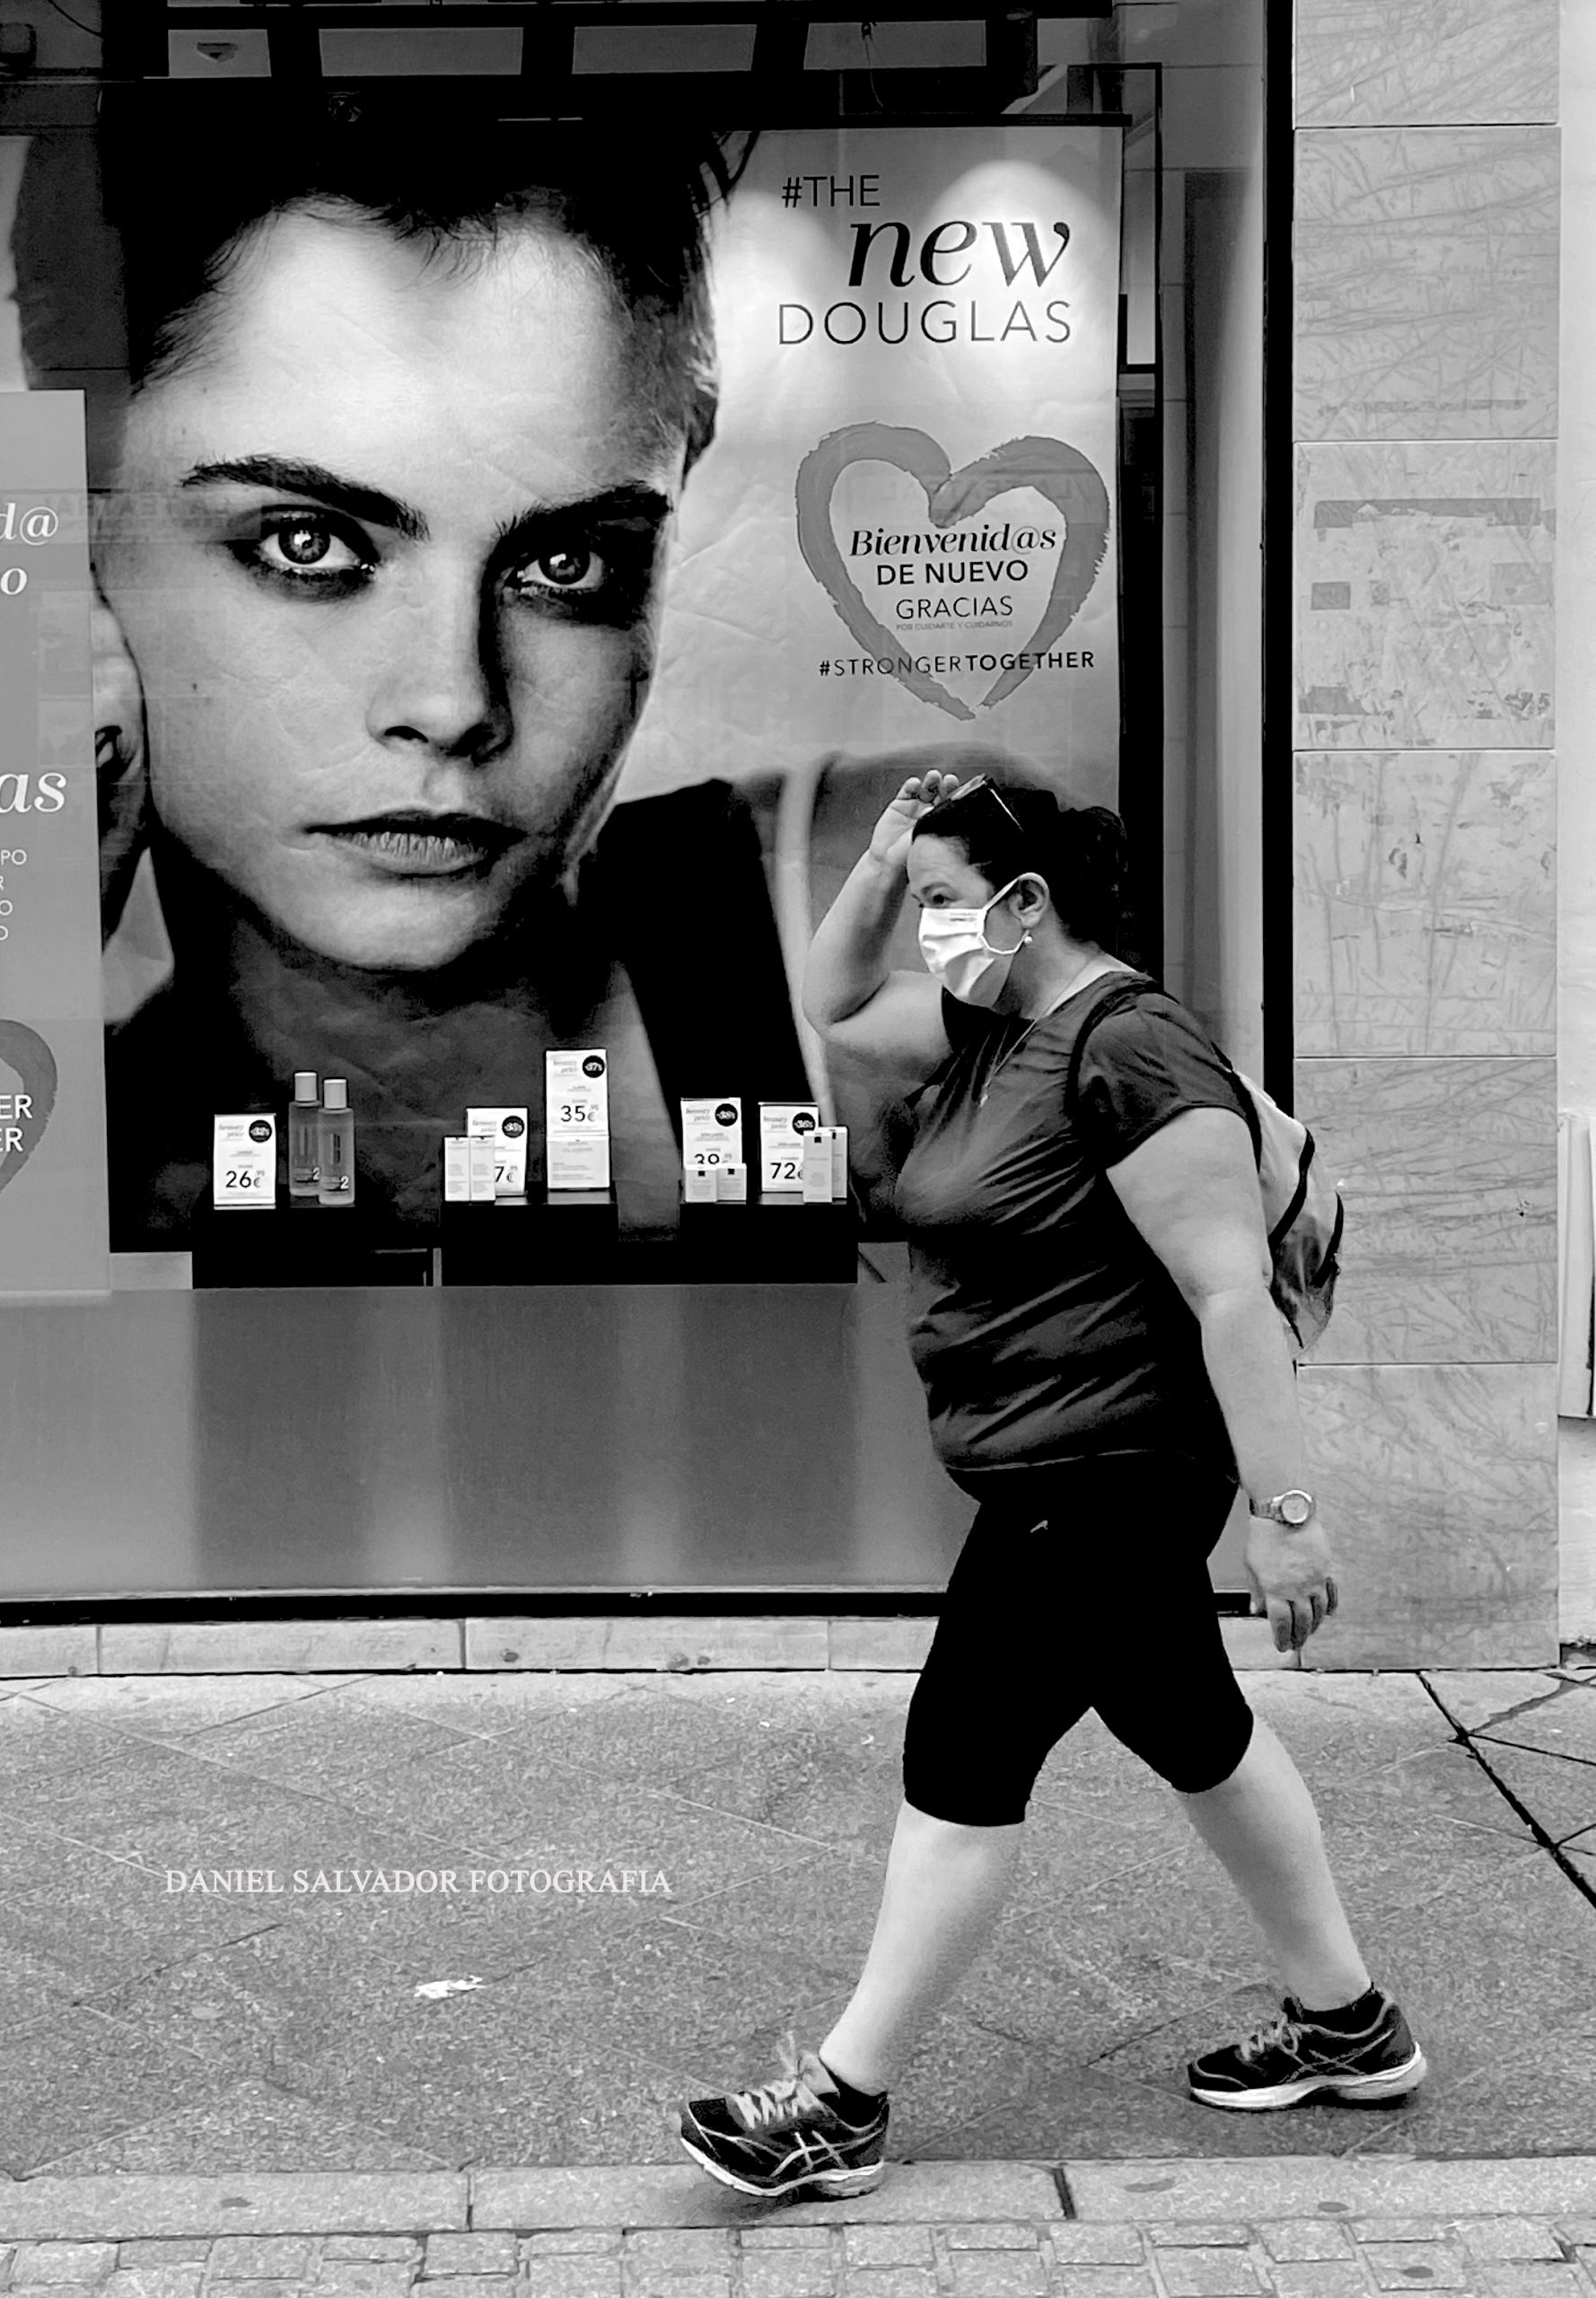 Street Photography @Daniel Salvador Fotografía. Covid 19. iPhone 11